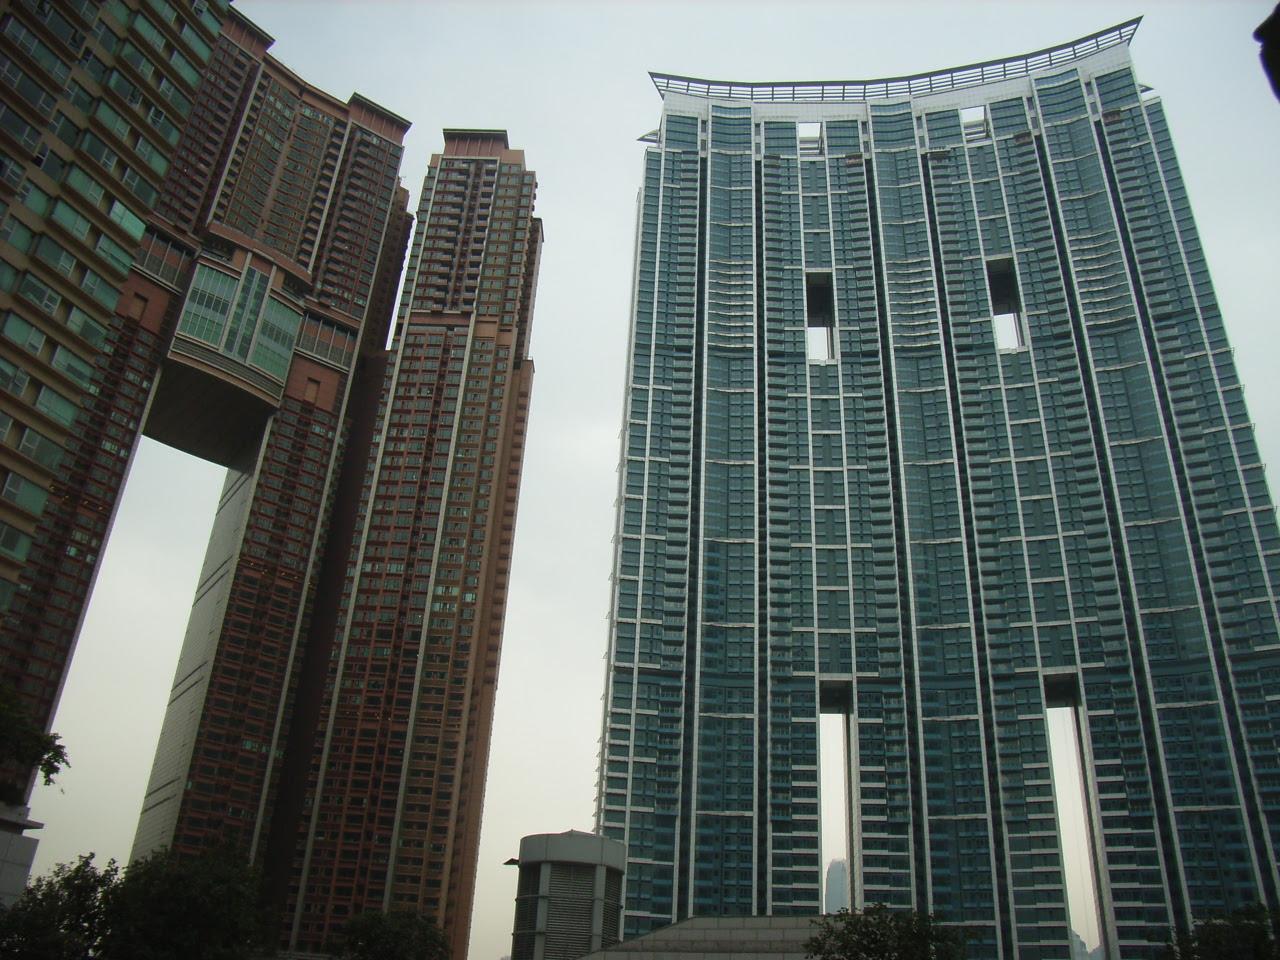 http://upload.wikimedia.org/wikipedia/commons/e/e0/HK_MTR_Kln_Station_The_Arch_n_The_Harbour_Side_916.jpg